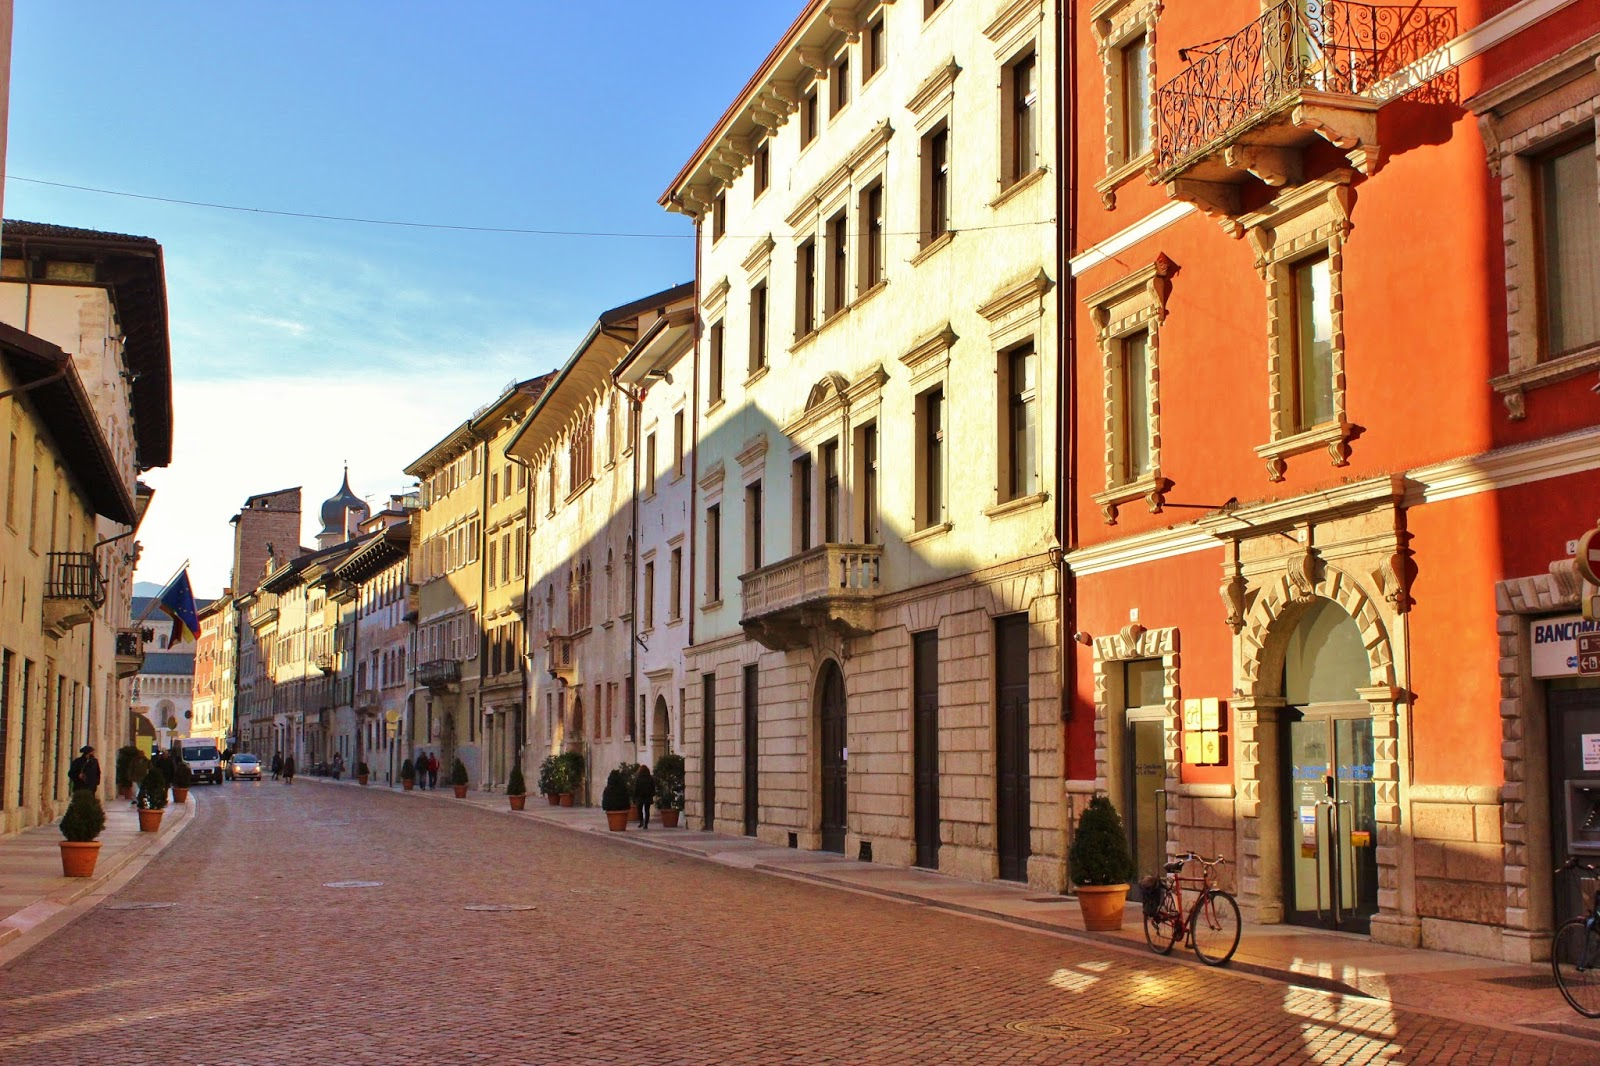 Trento of Trentino Alto Adige region